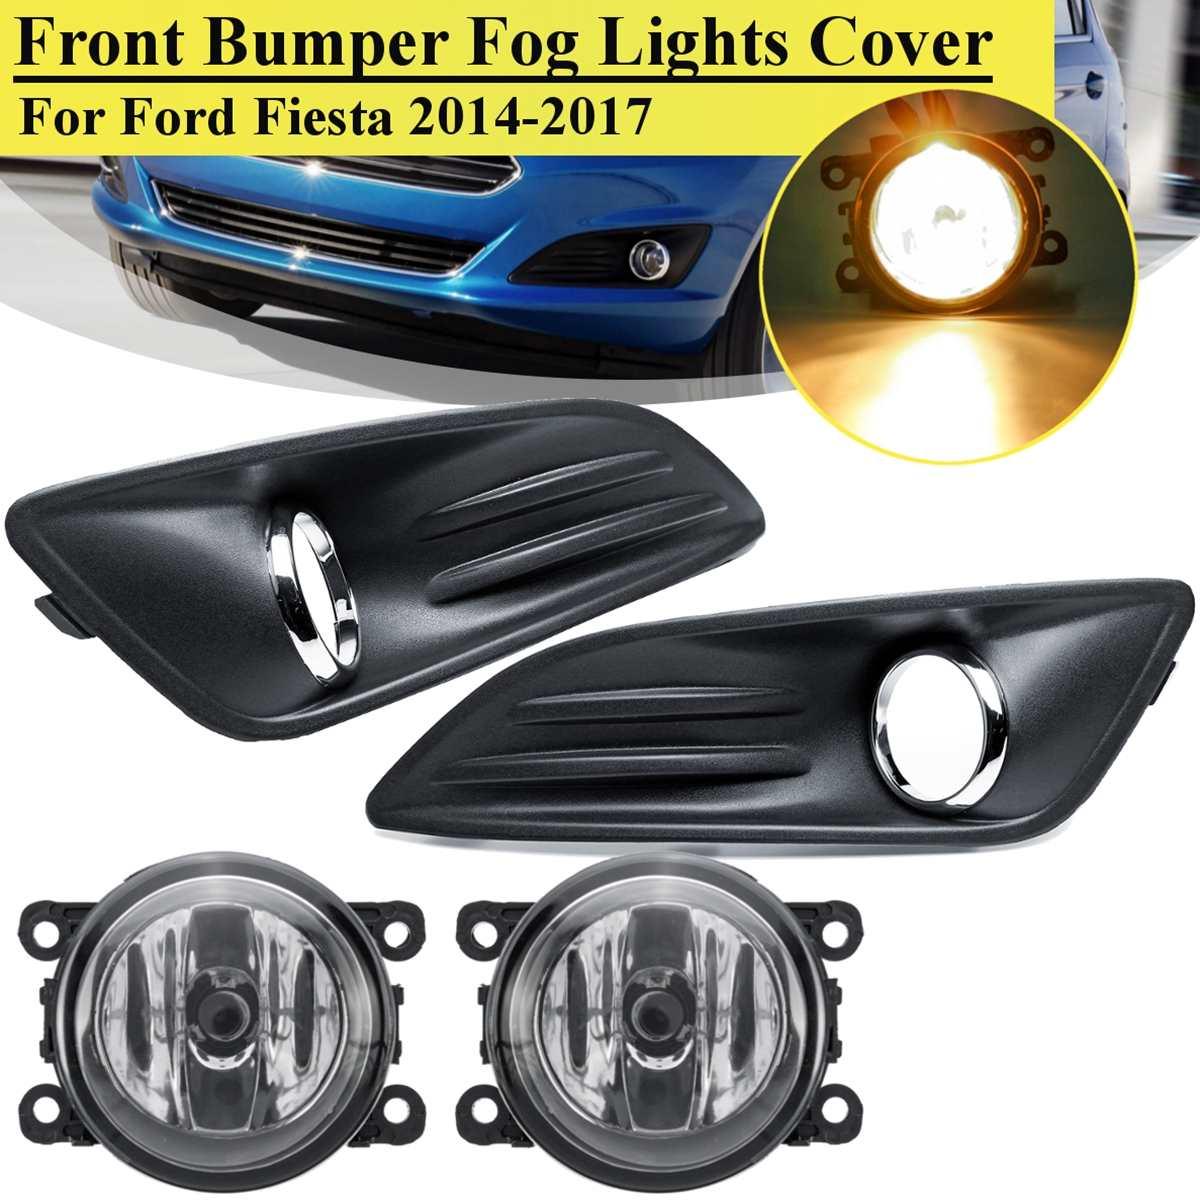 Lamp Kit 4pcs For 2014 Ford Fiesta Front Bumper Fog Light Cover Grille